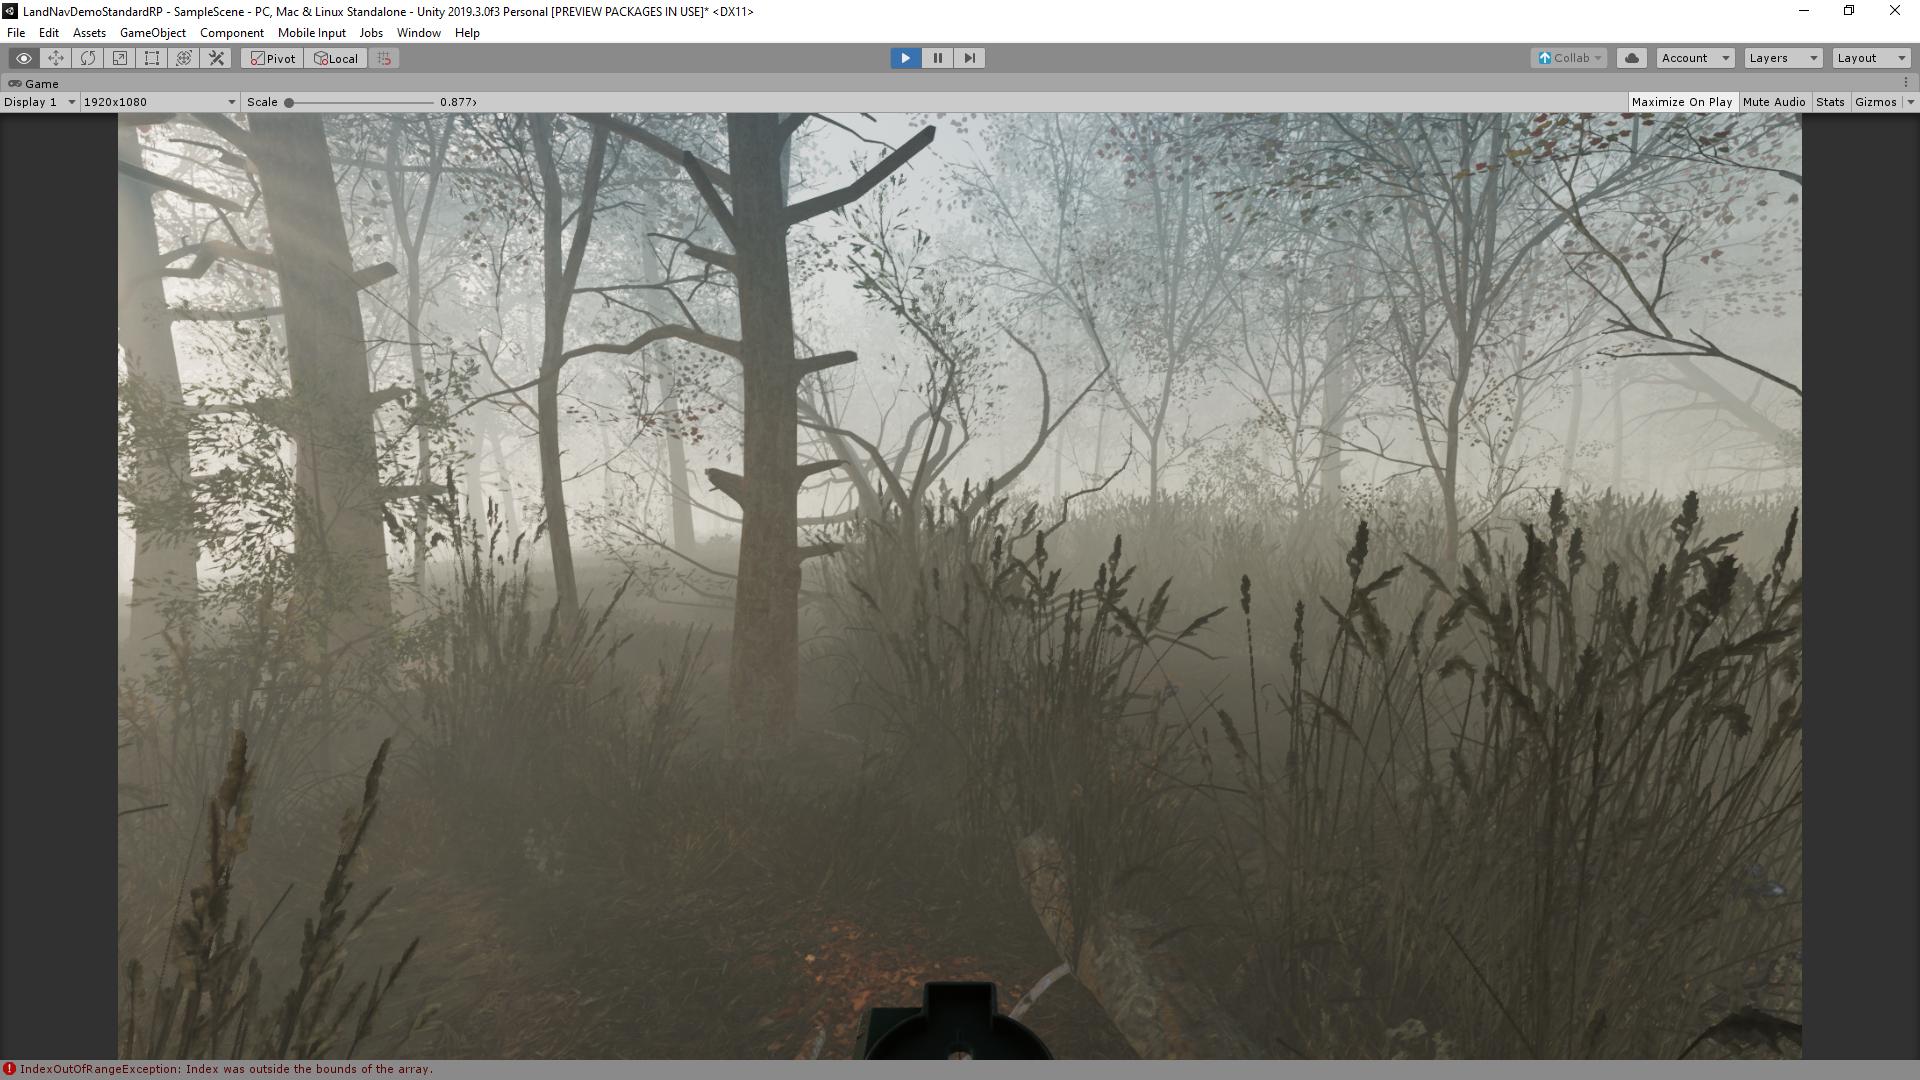 Desktop Screenshot 2020.01.05 - 23.11.58.60.png